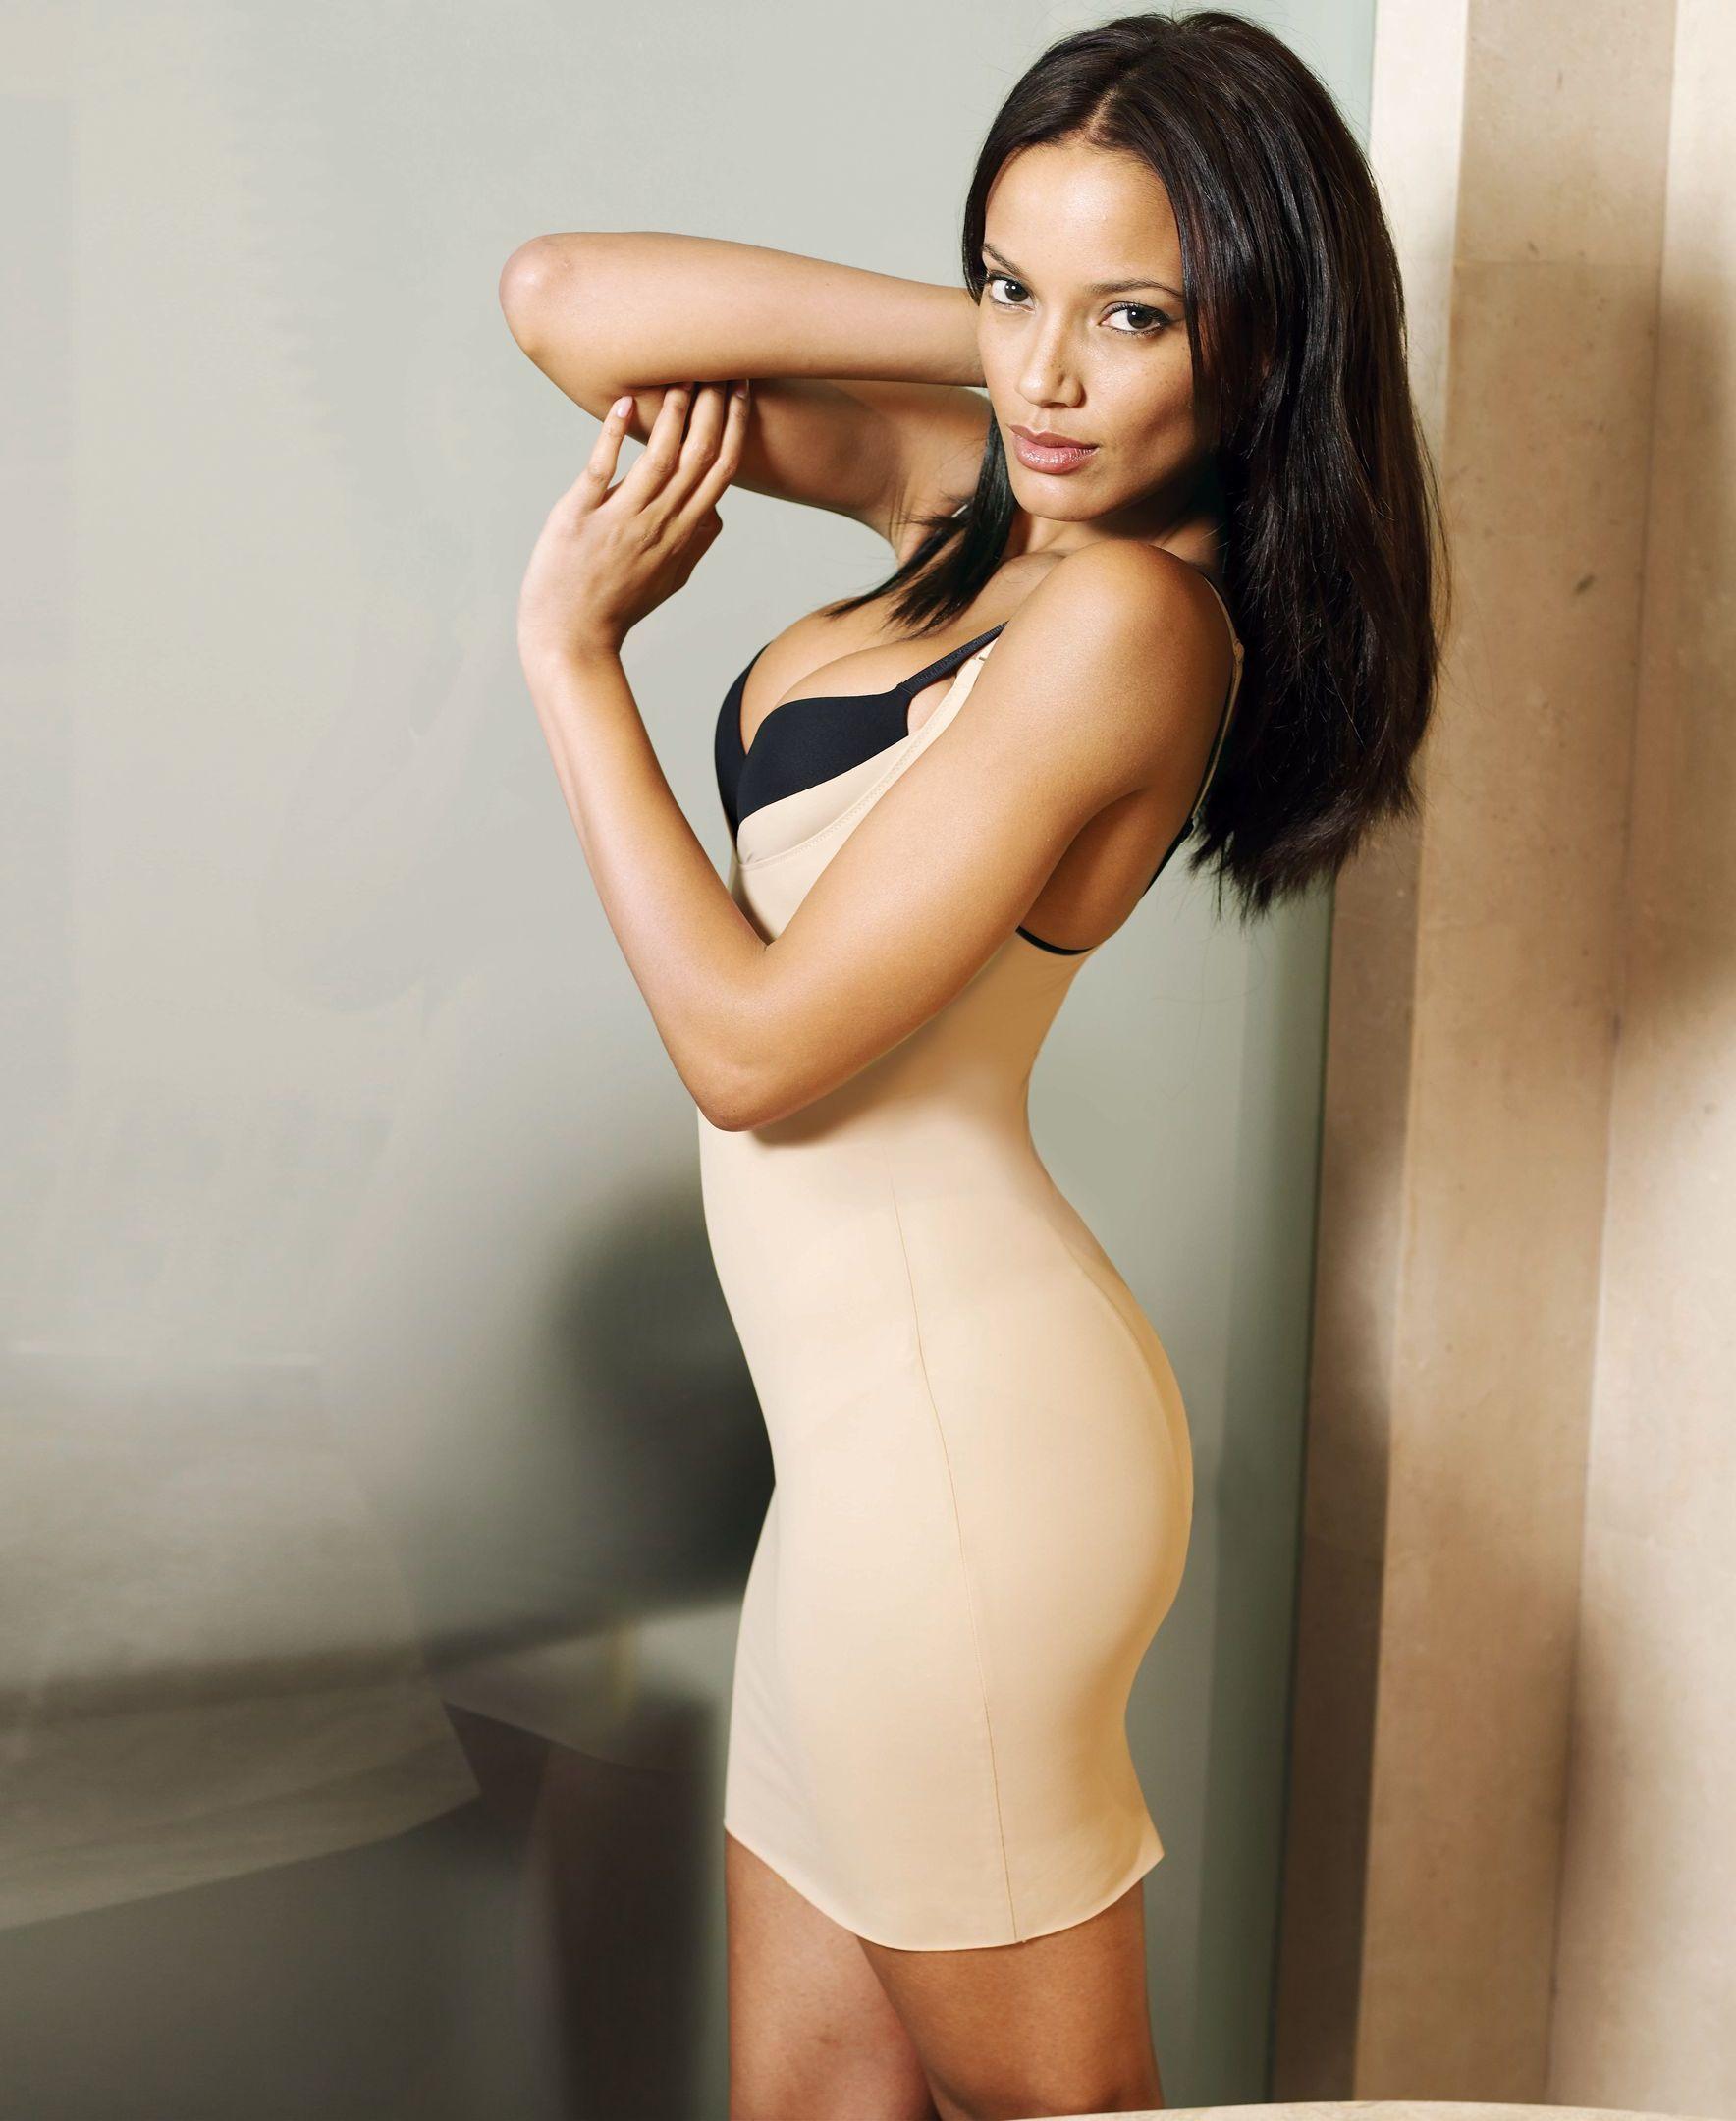 Фото красивые тела красавиц 6 фотография